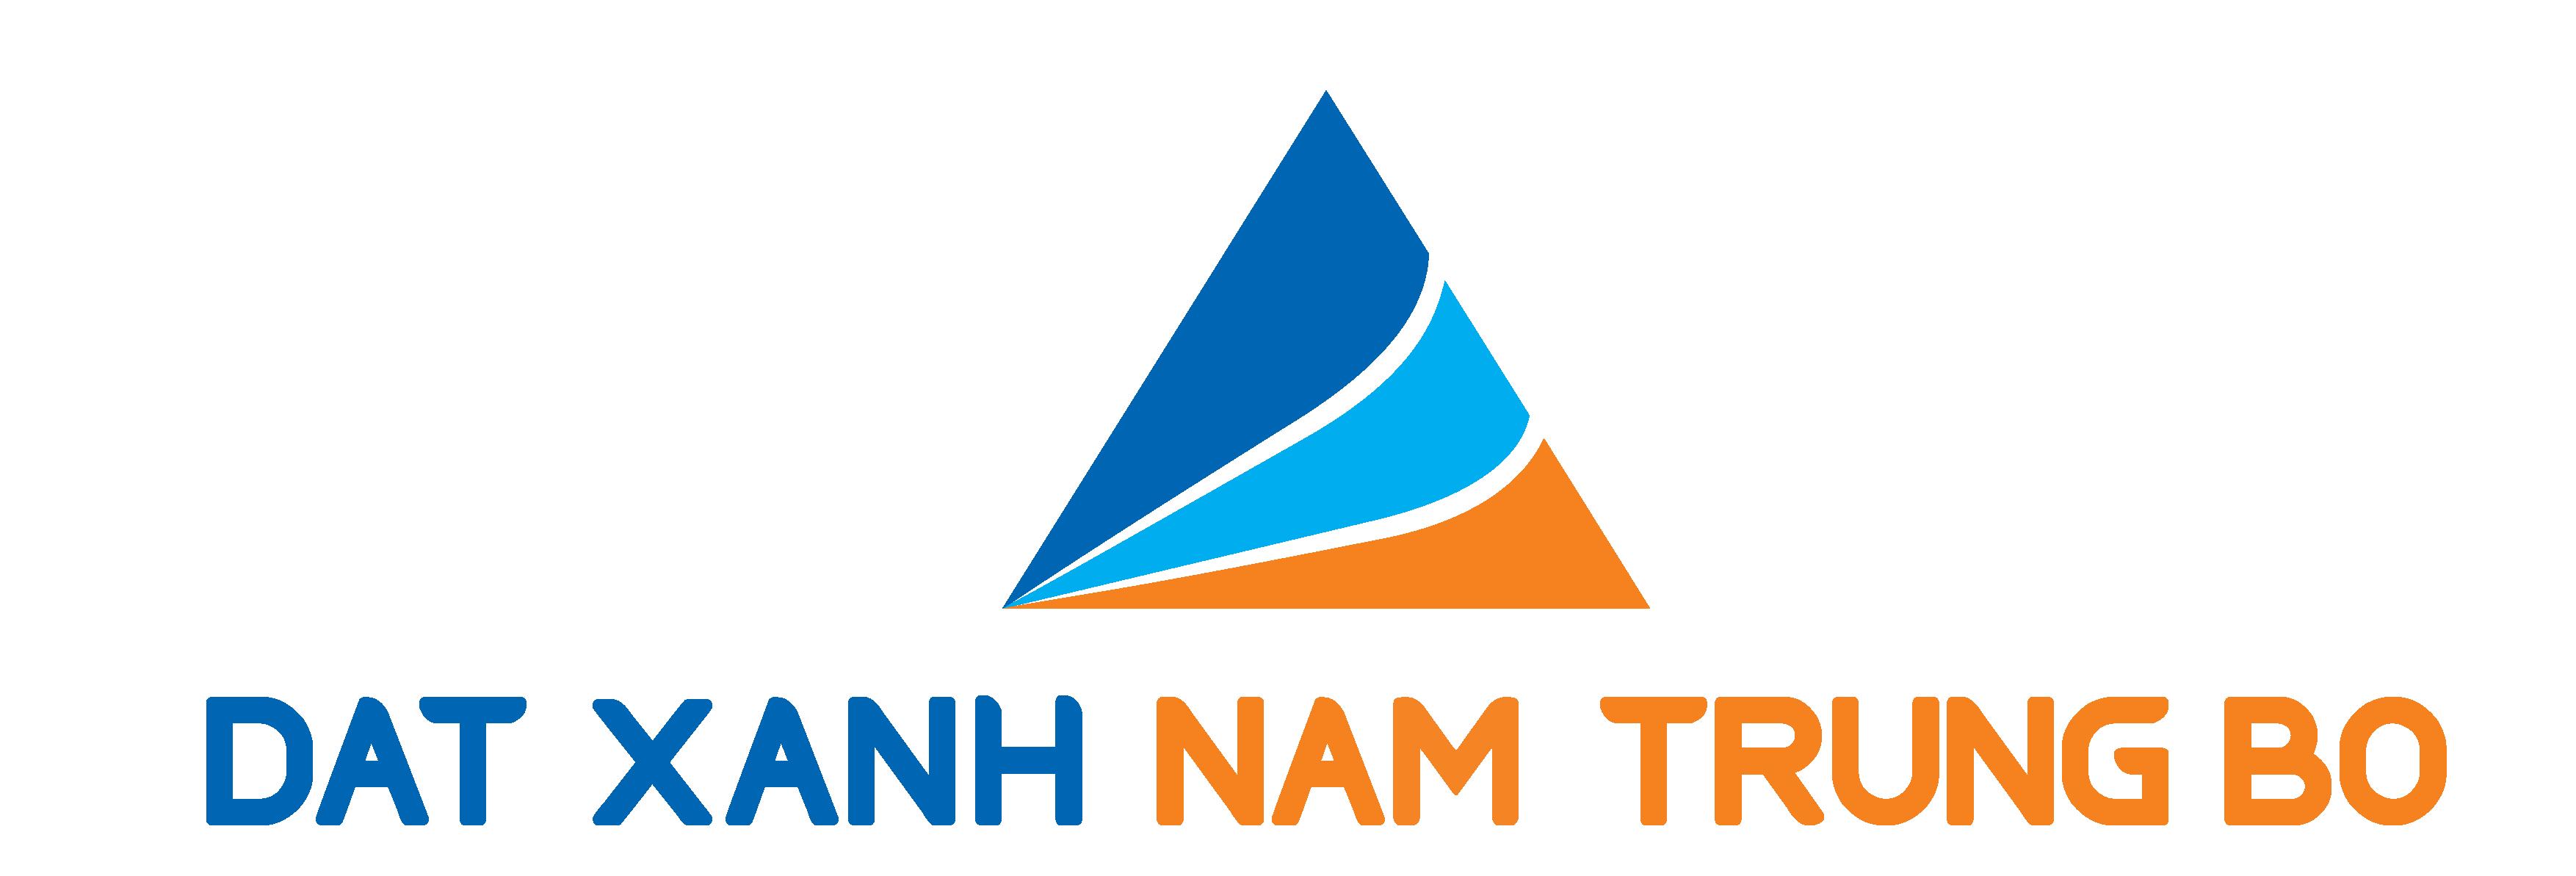 04-Dat-Xanh-Nam-Trung-Bo-04-1.png